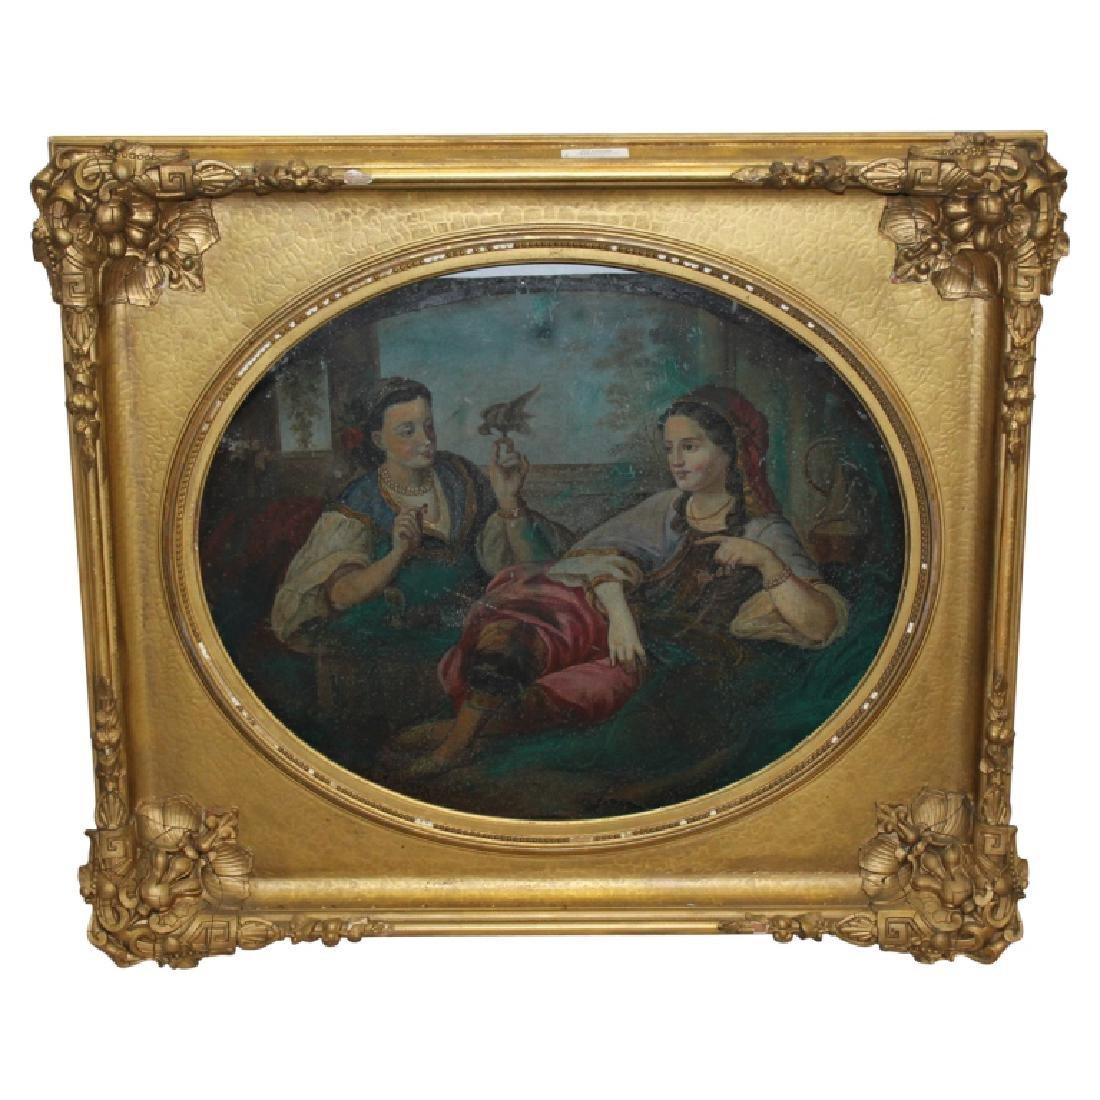 Gold Gilt Period Frame with Tin Artwork